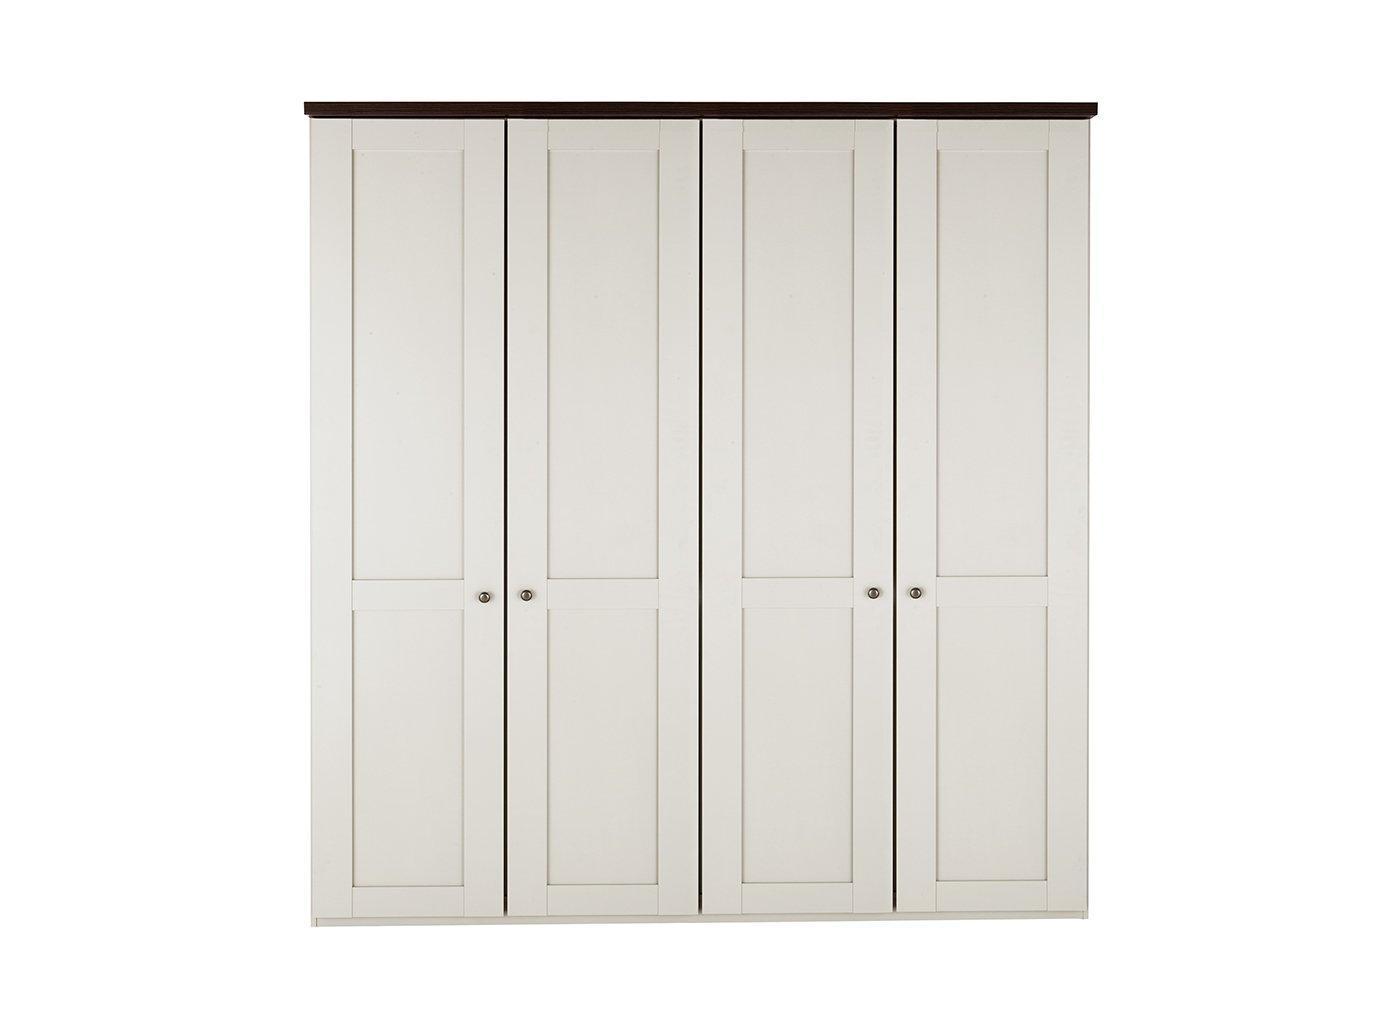 sloane-4-door-wardrobe---champagne-and-dark-wood